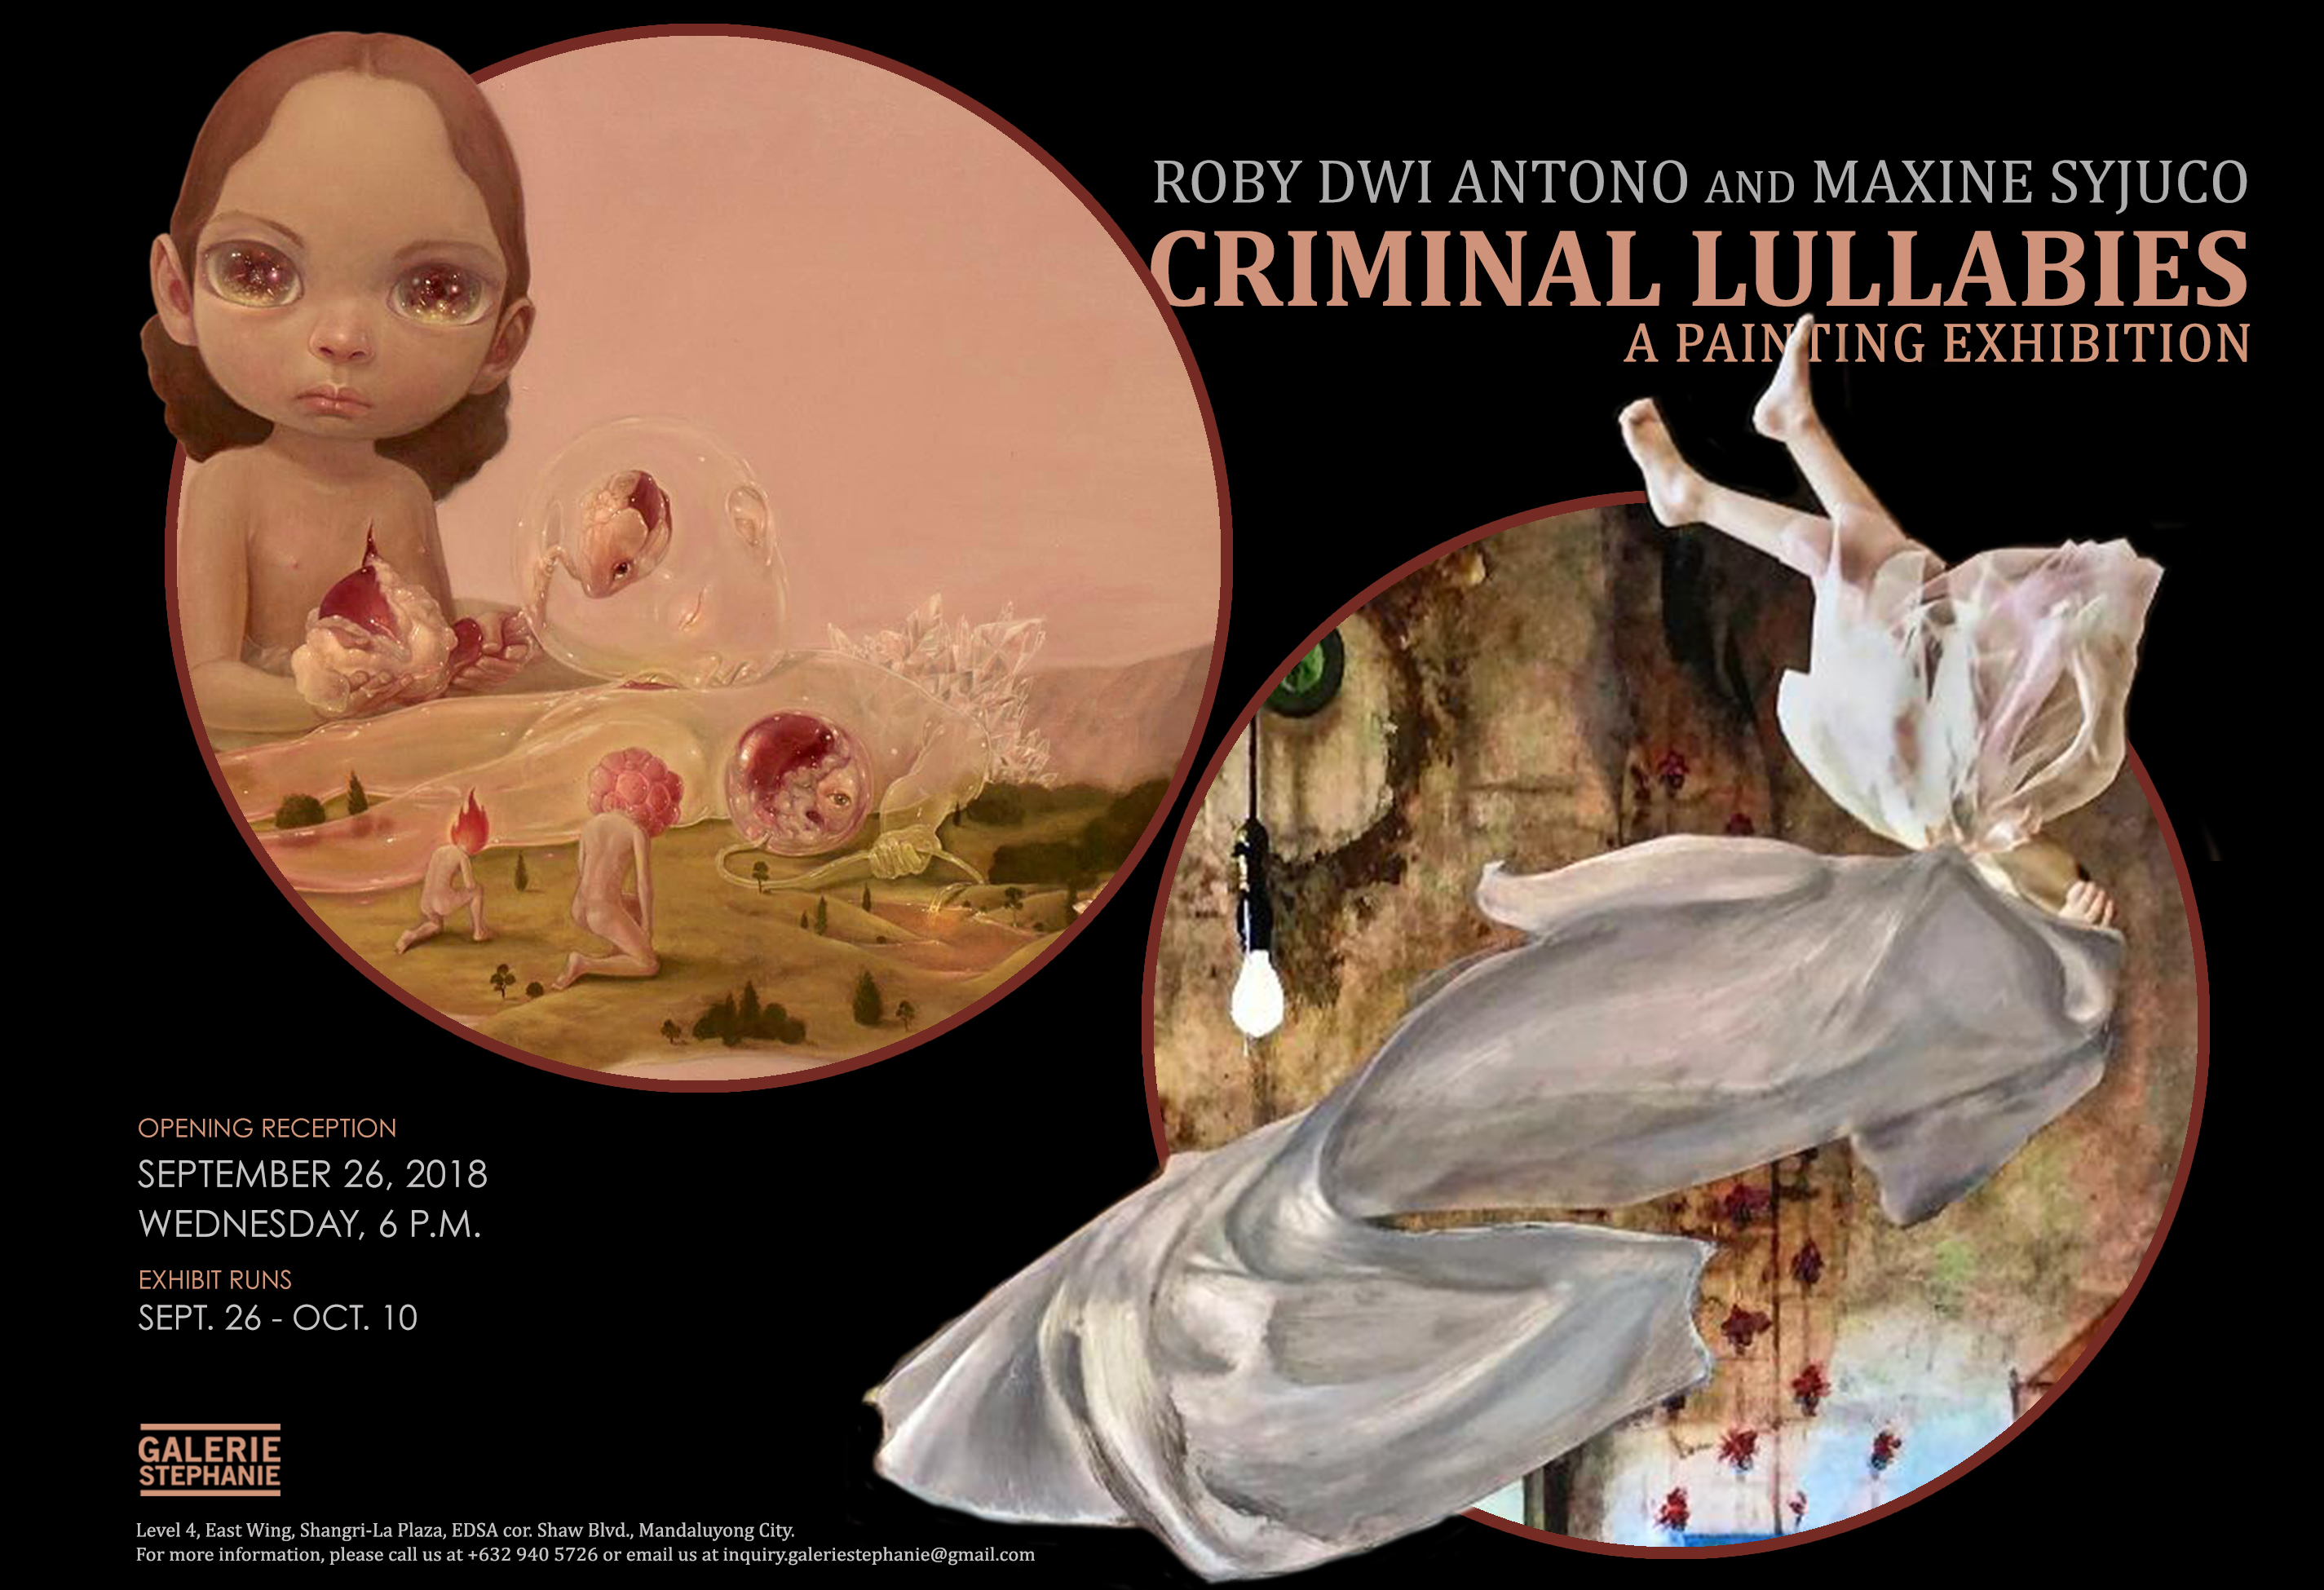 poster-web-large-IG-e1439769985482